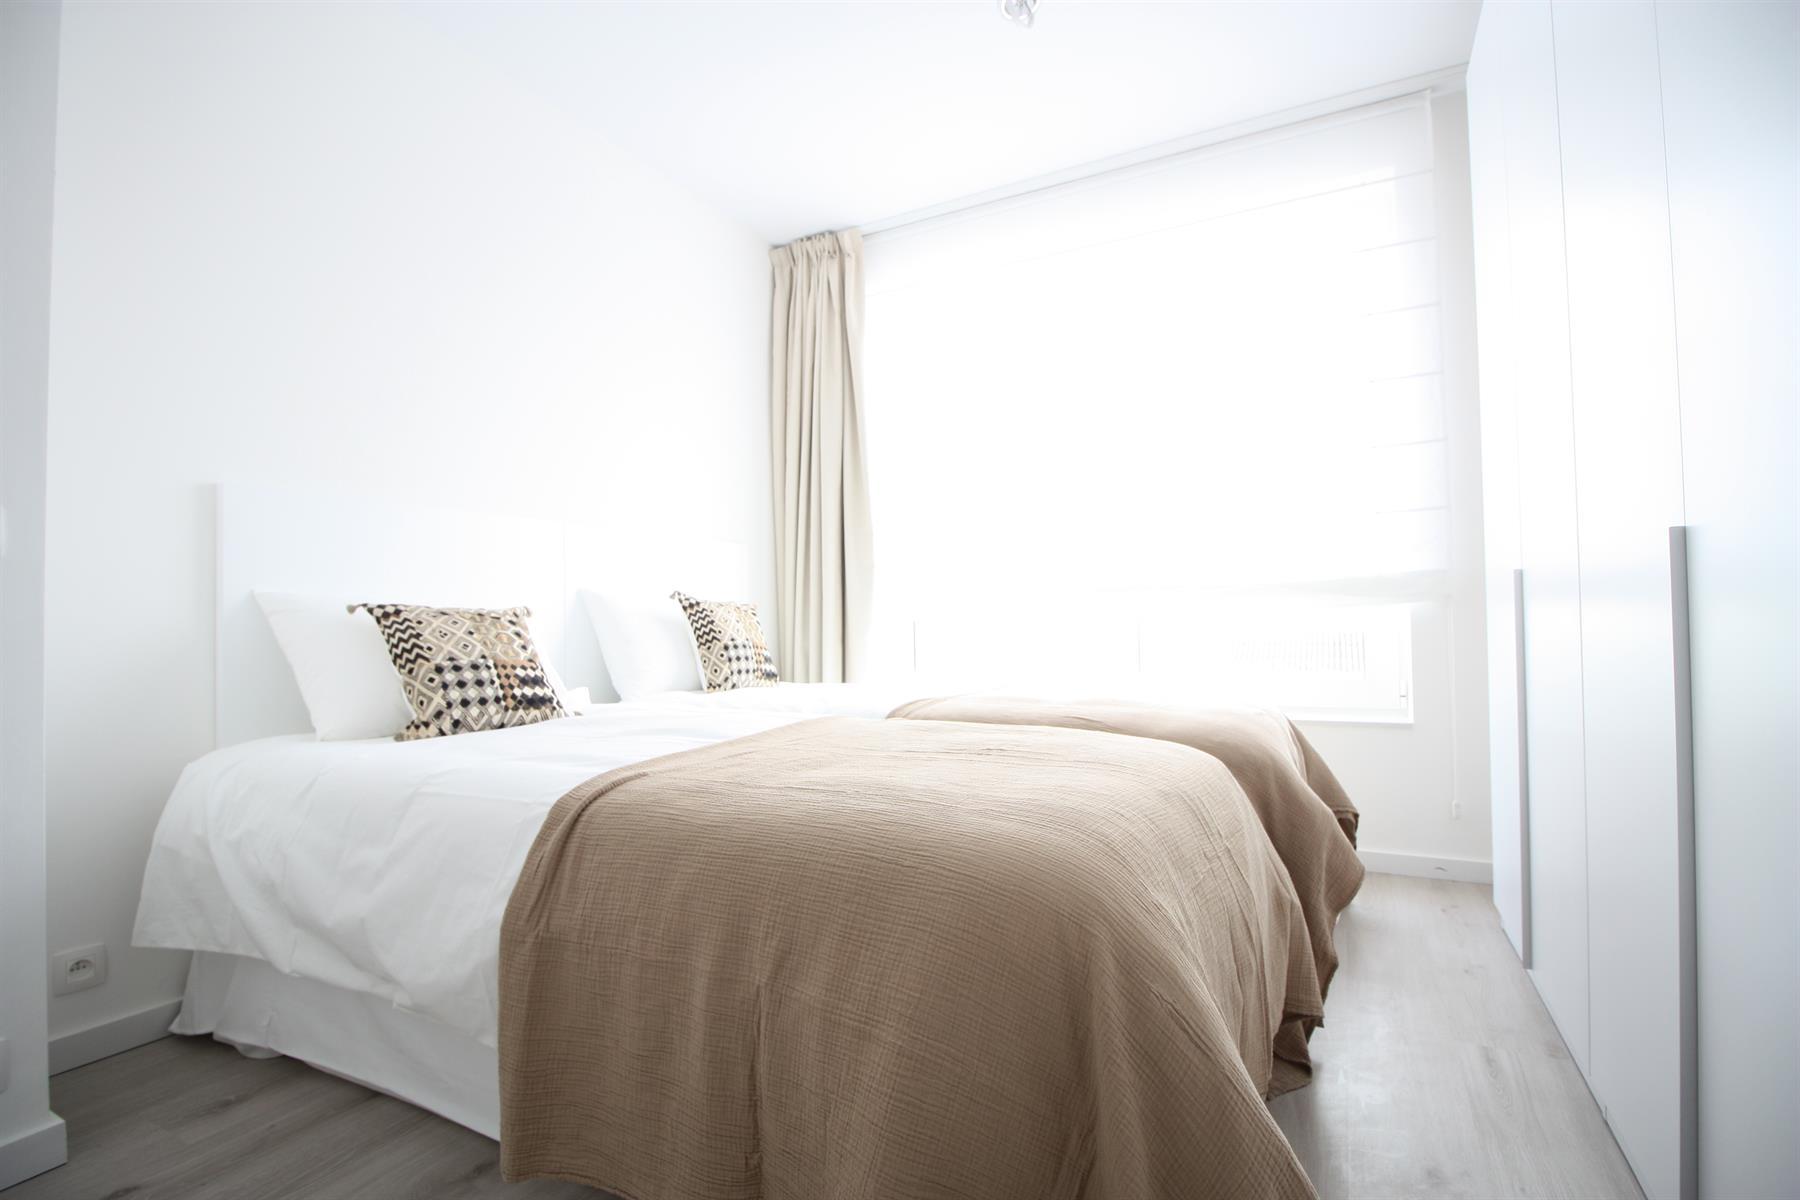 Appartement - Woluwe-Saint-Lambert - #4395355-11